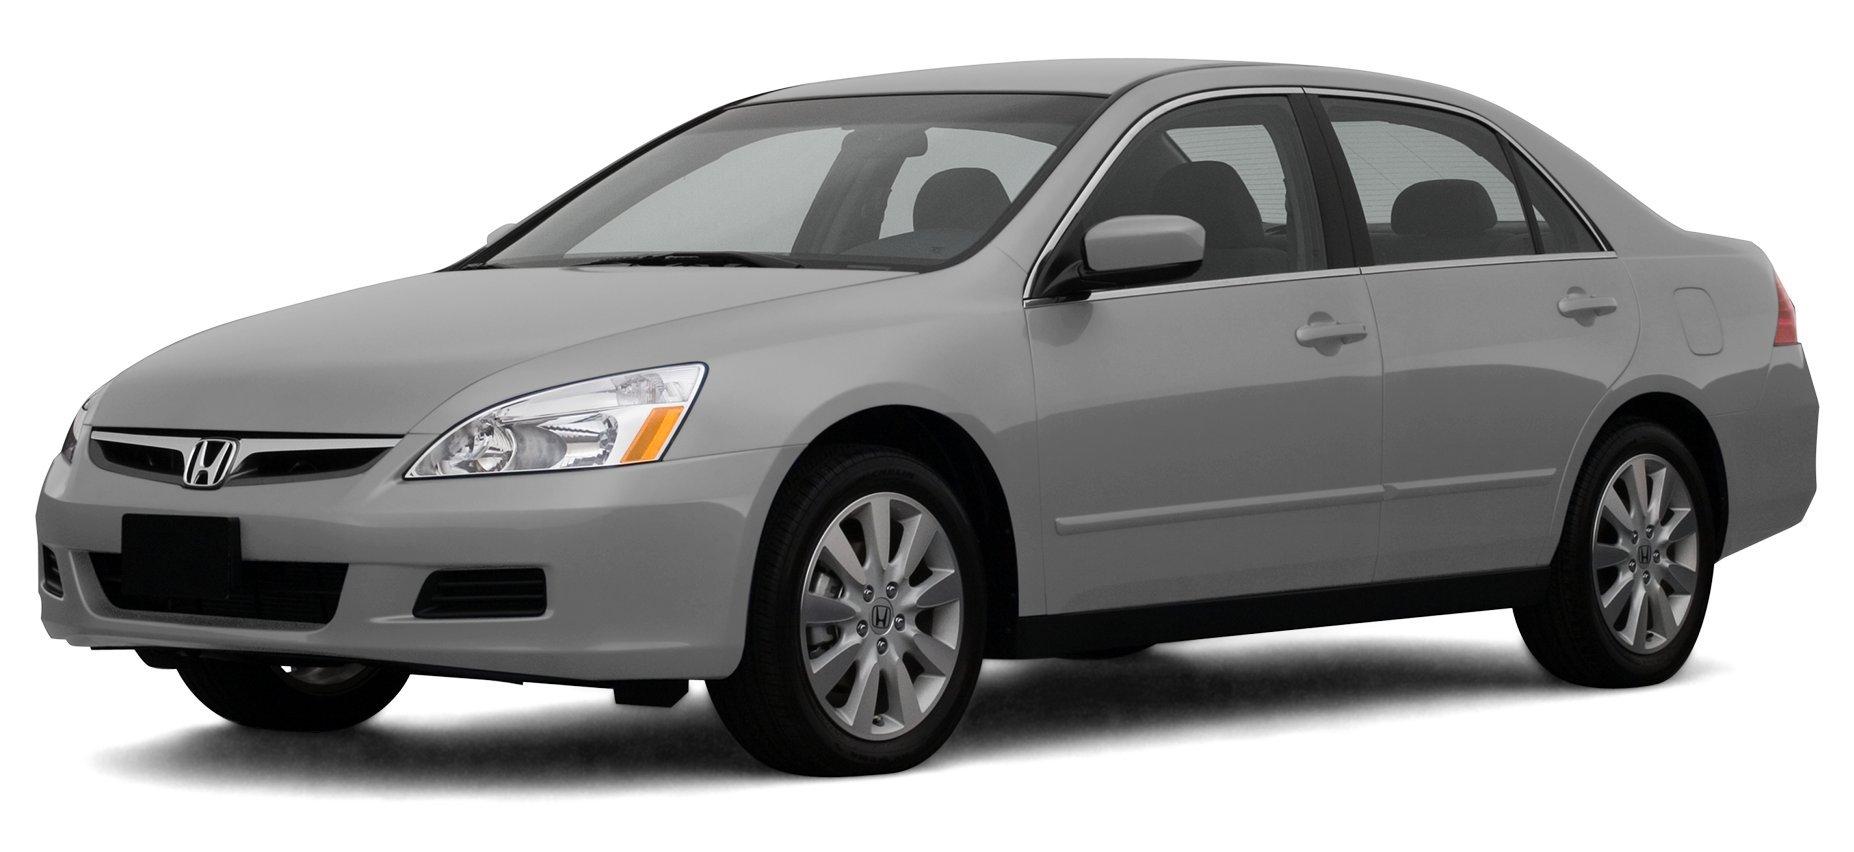 ... 2007 Honda Accord LX SE, 4-Door V6 Automatic Transmission ...